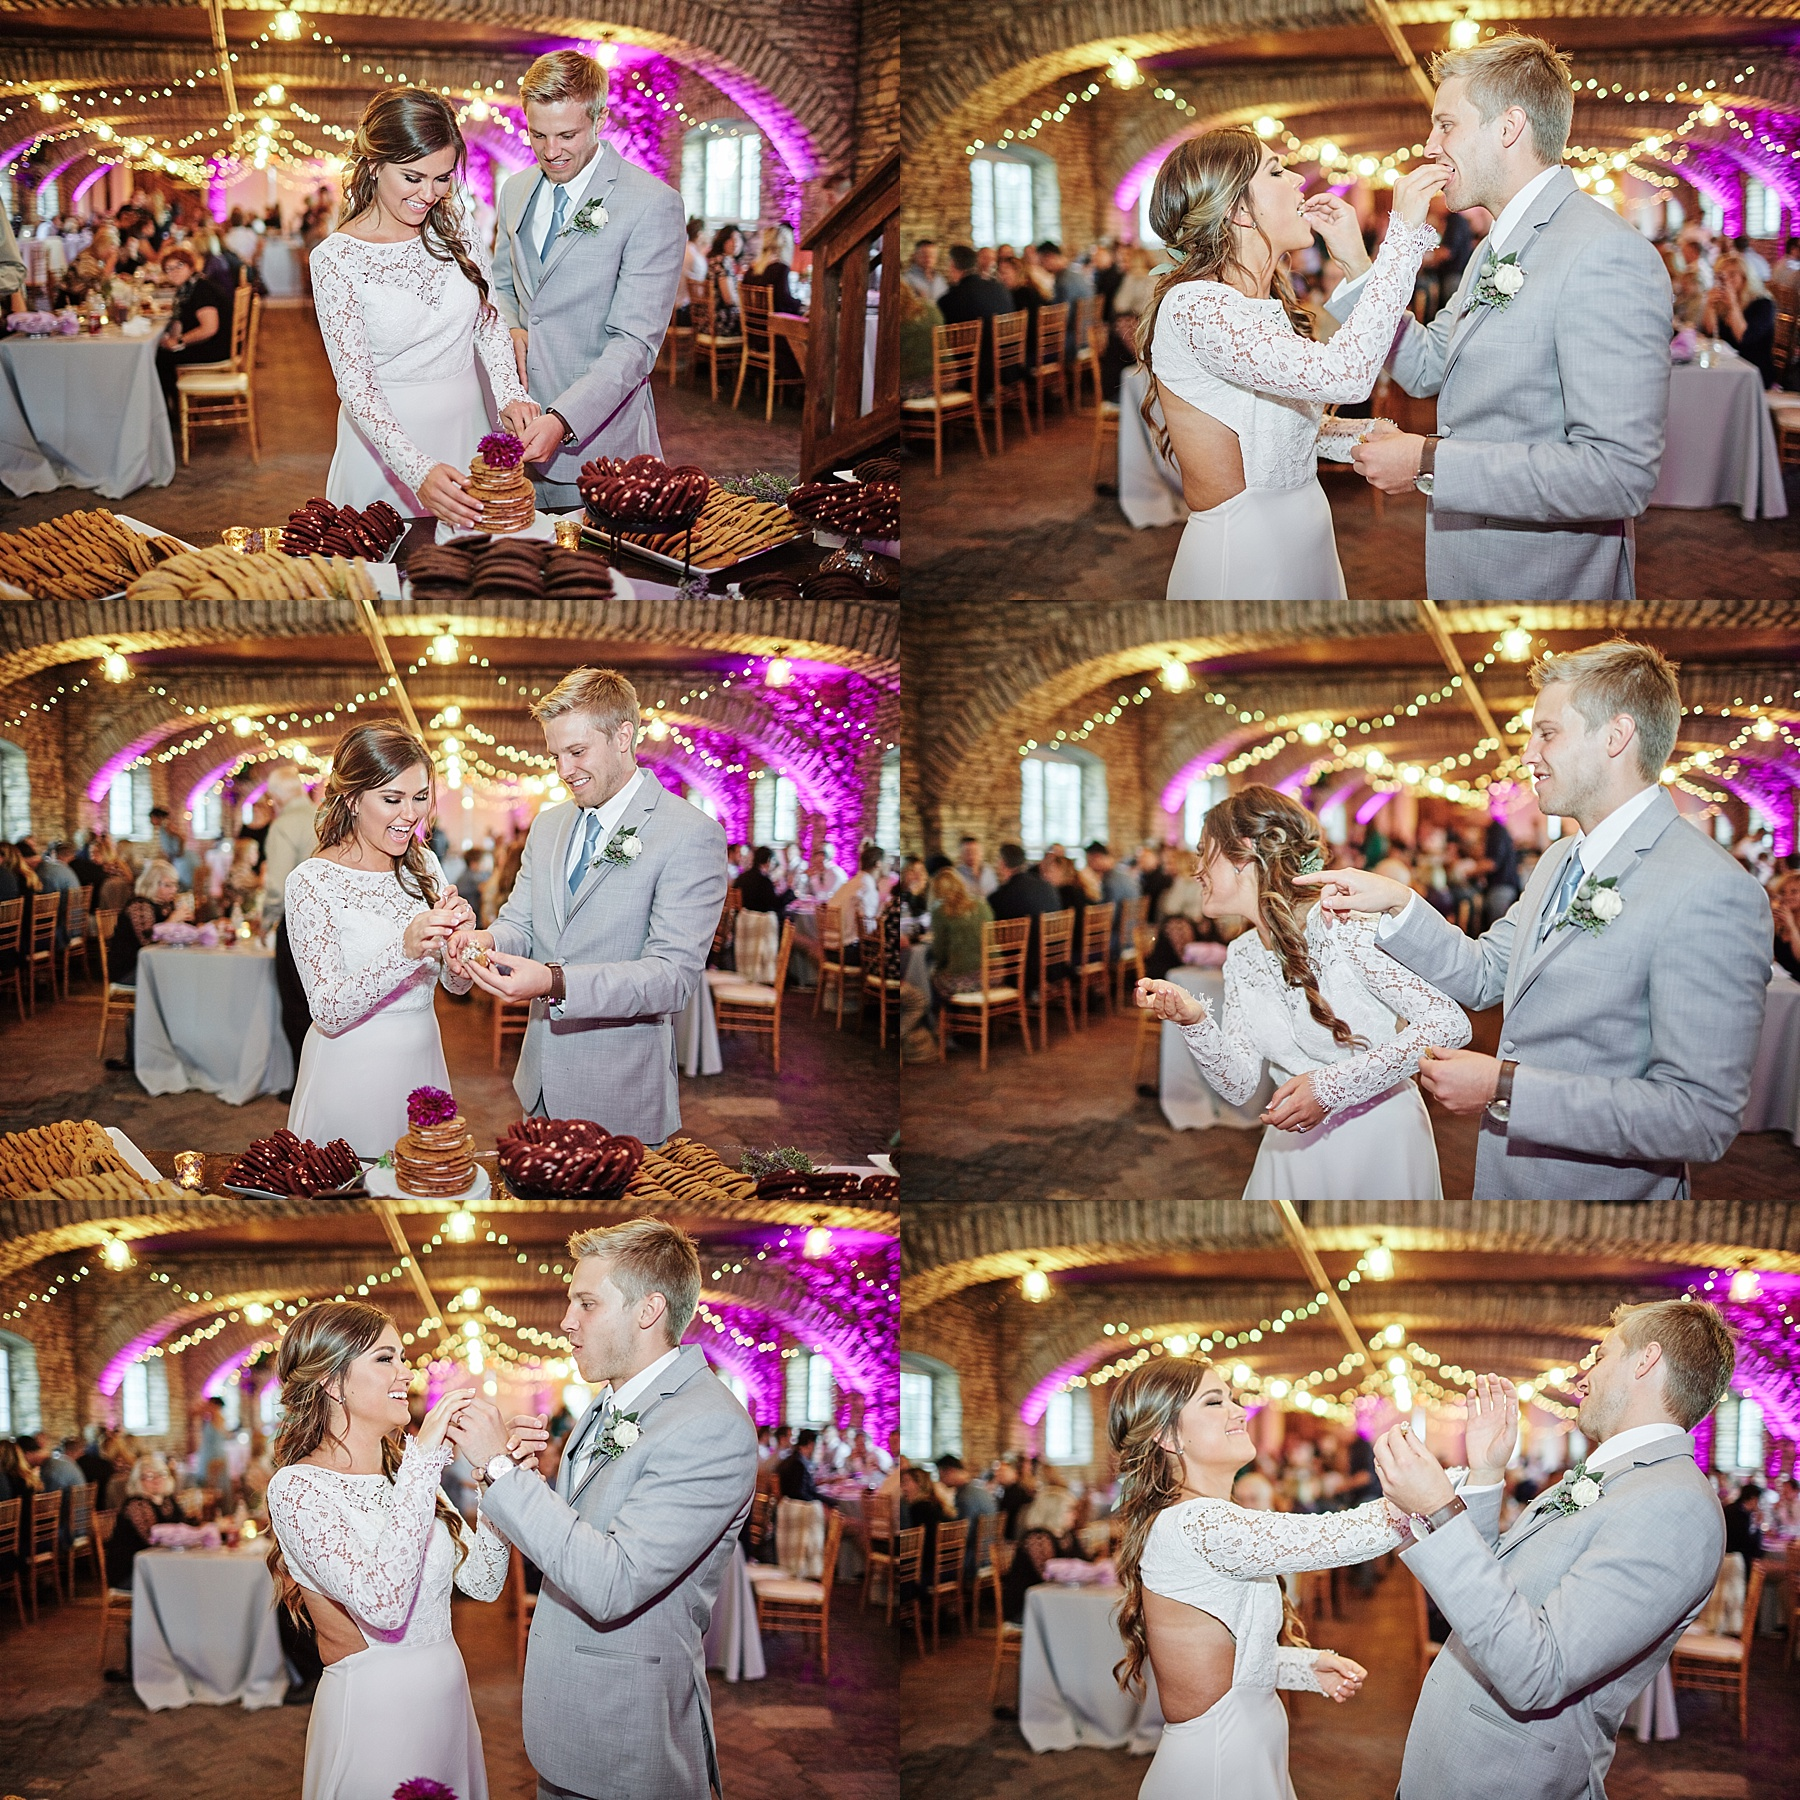 Maywood-Stone-Barn-Wedding-Rochester-Minnesota-Perry-James-Photo_0666.jpg